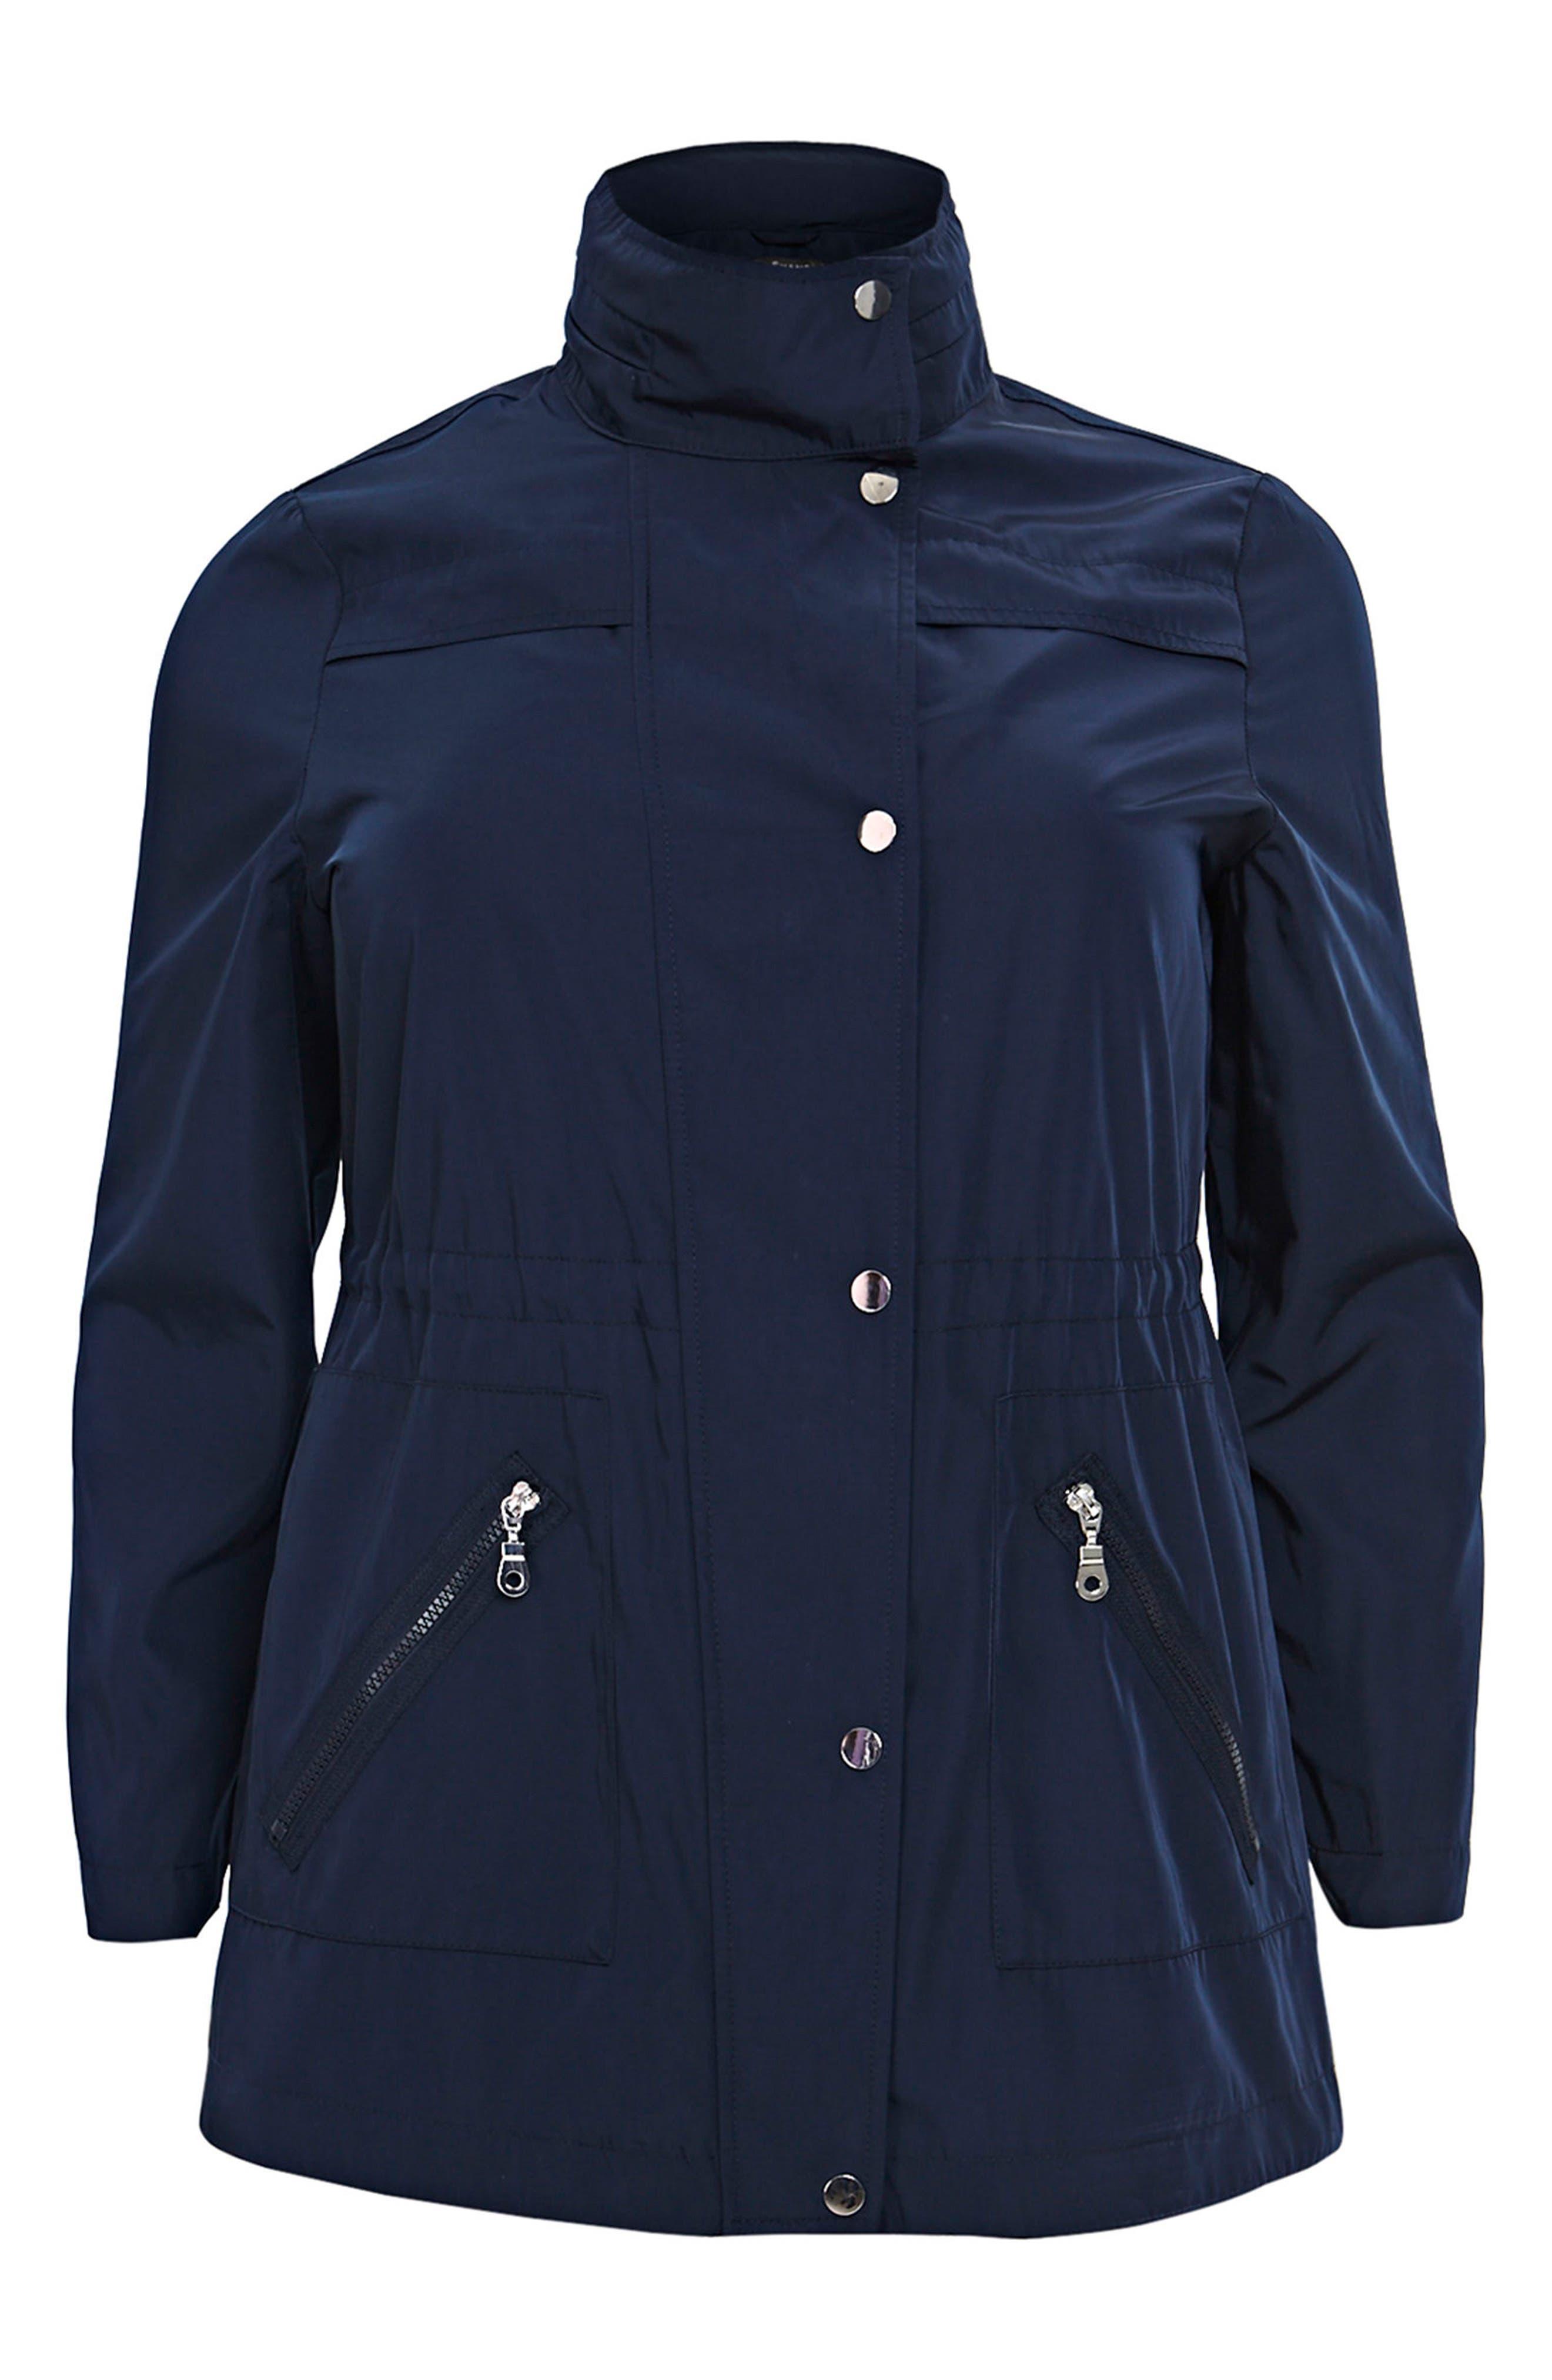 Zip Trim Jacket,                             Alternate thumbnail 3, color,                             Navy Blue